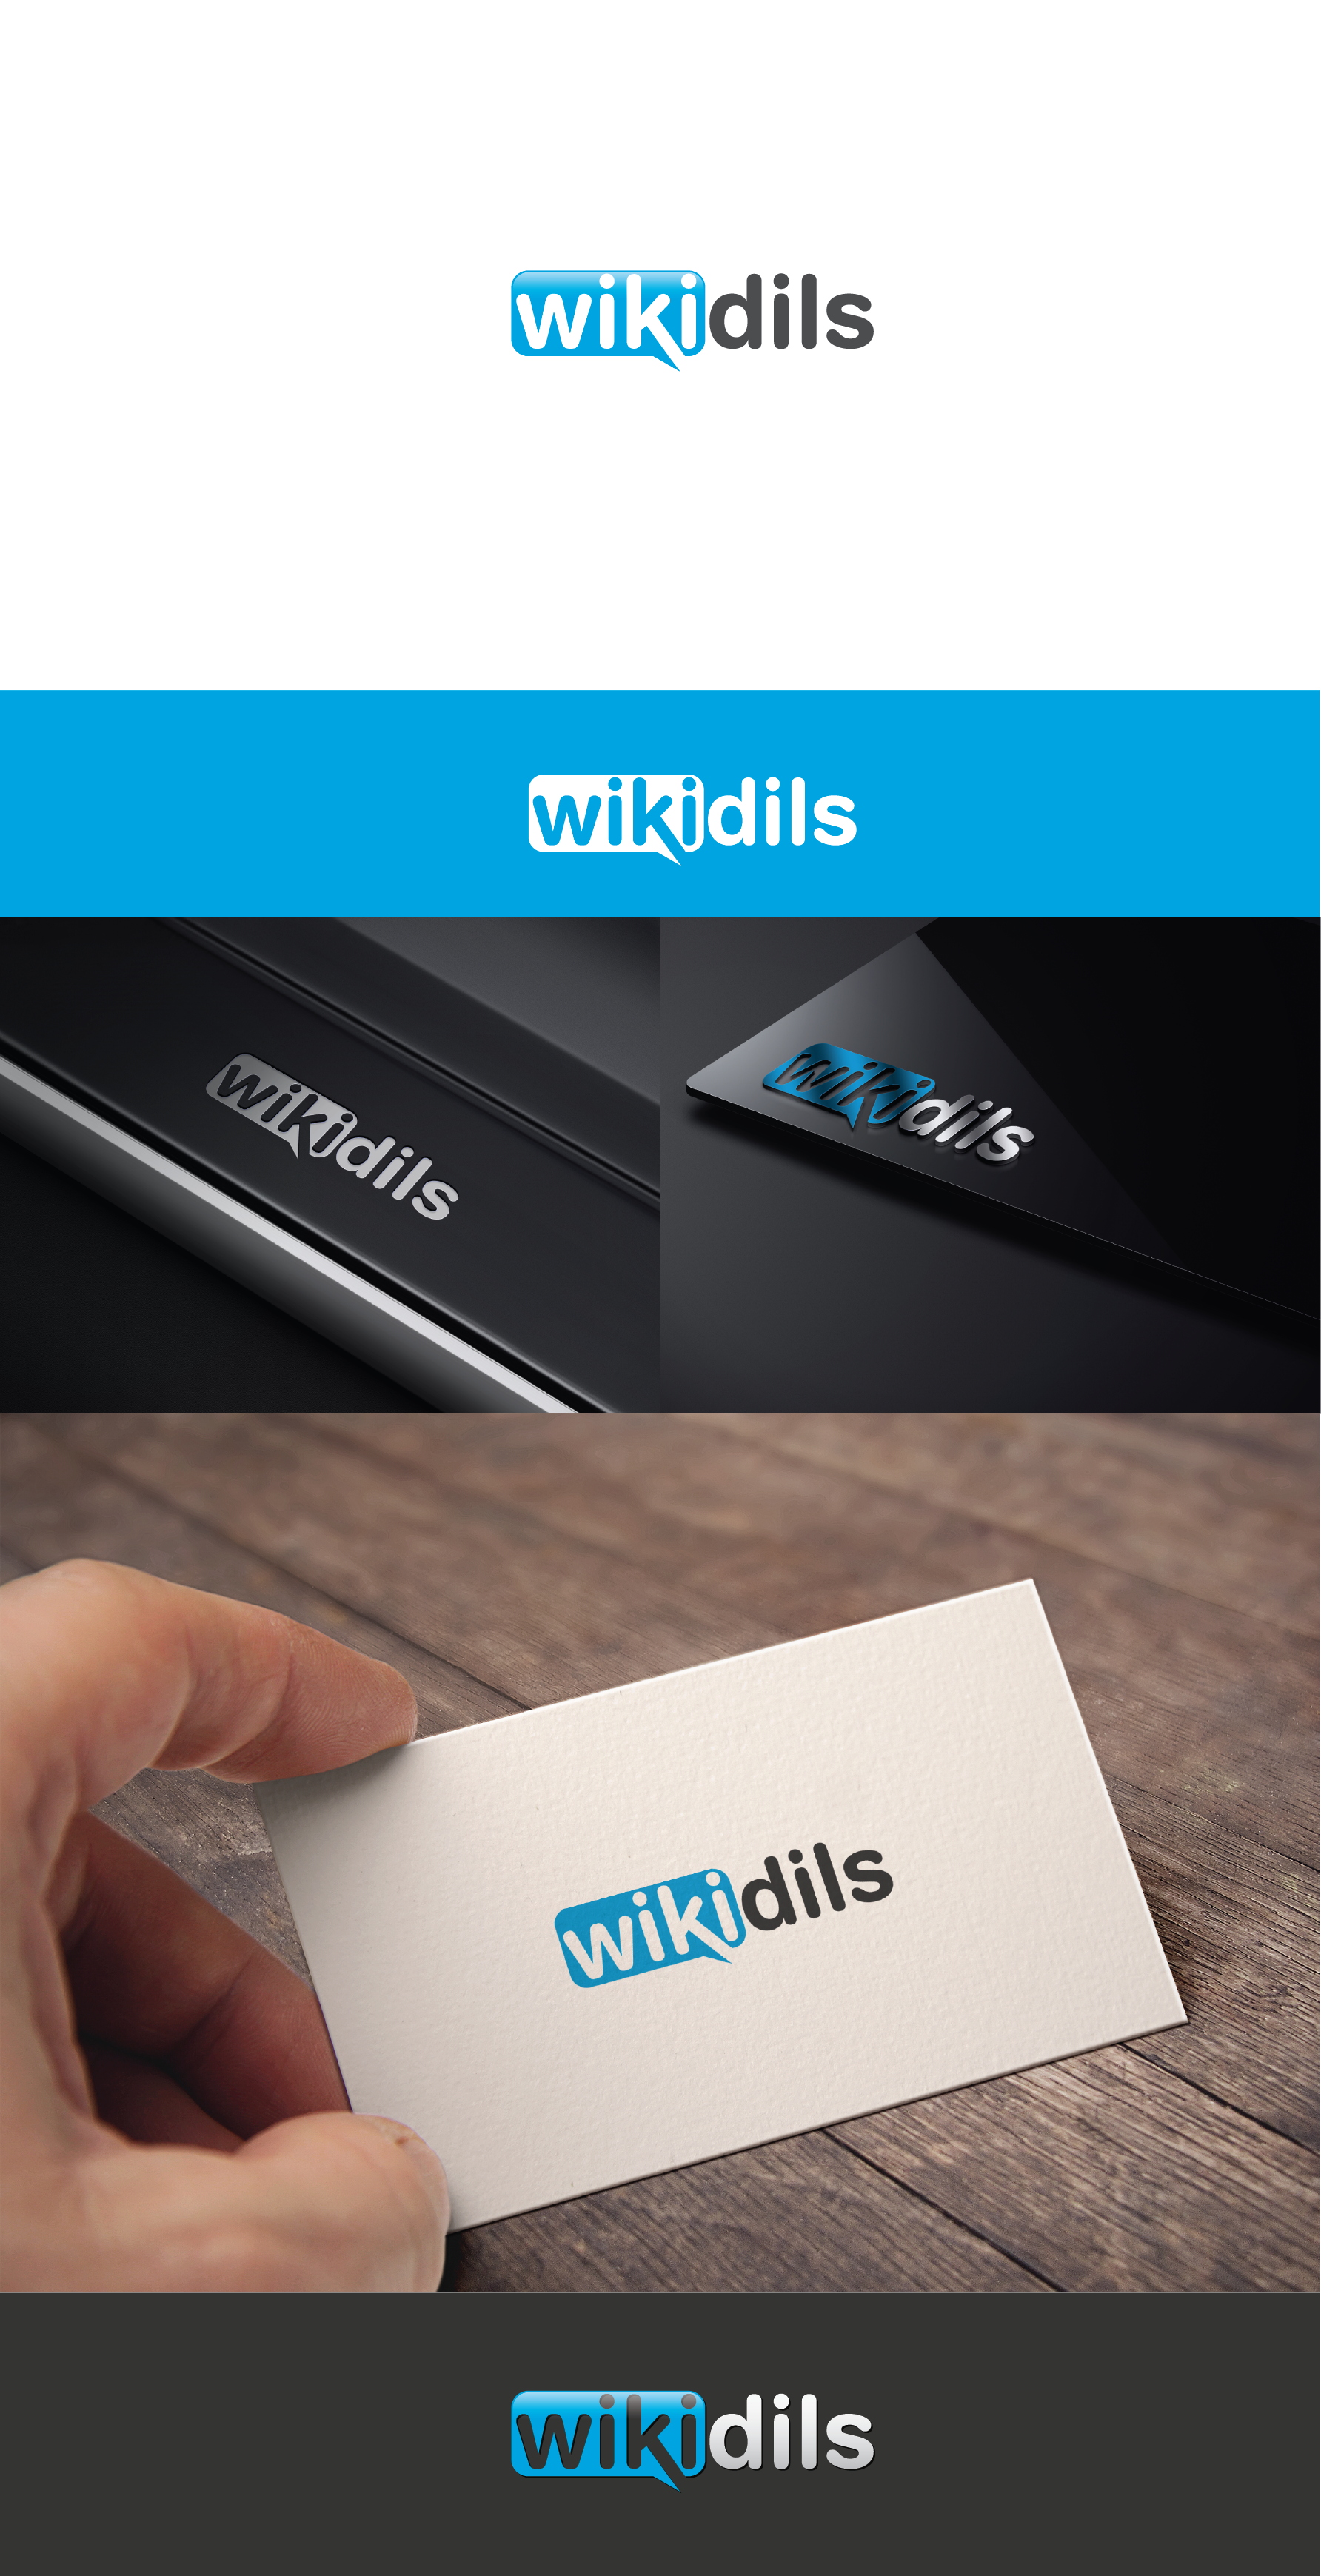 Design a logo for a new e-commerce company